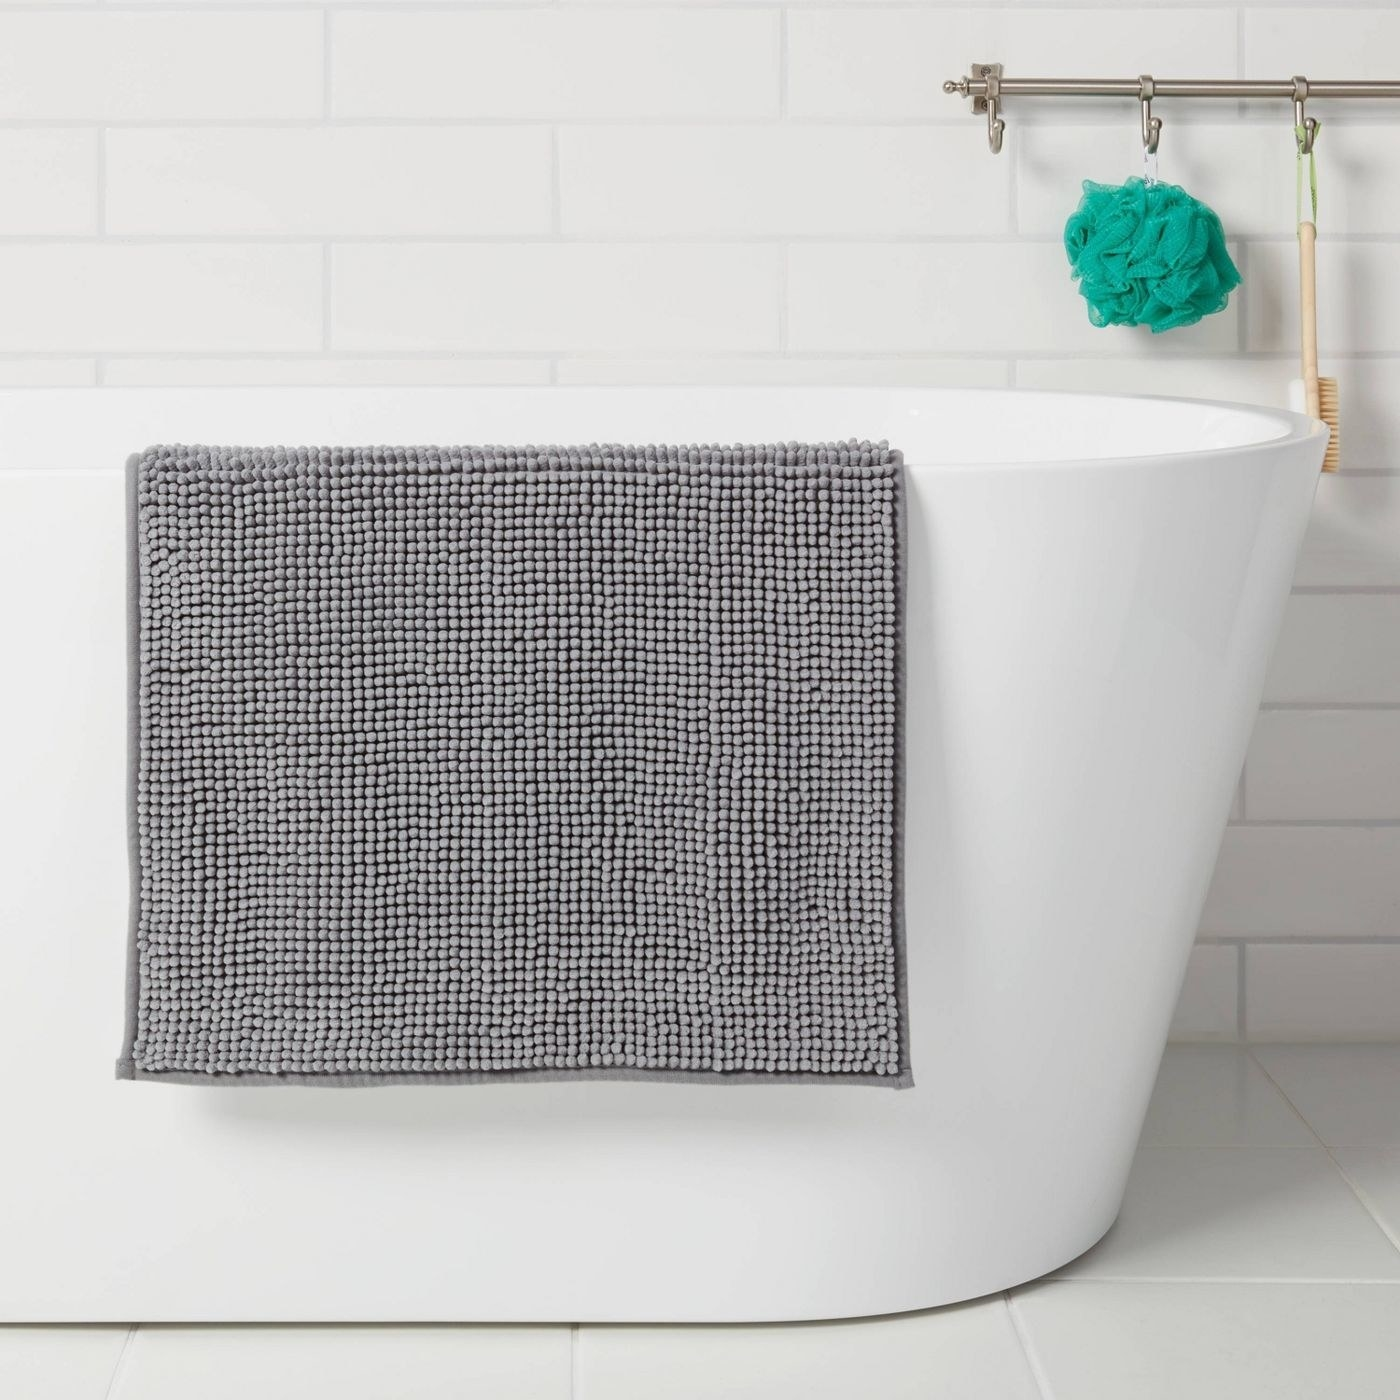 grey bath mat draped over the side of a white bath tub